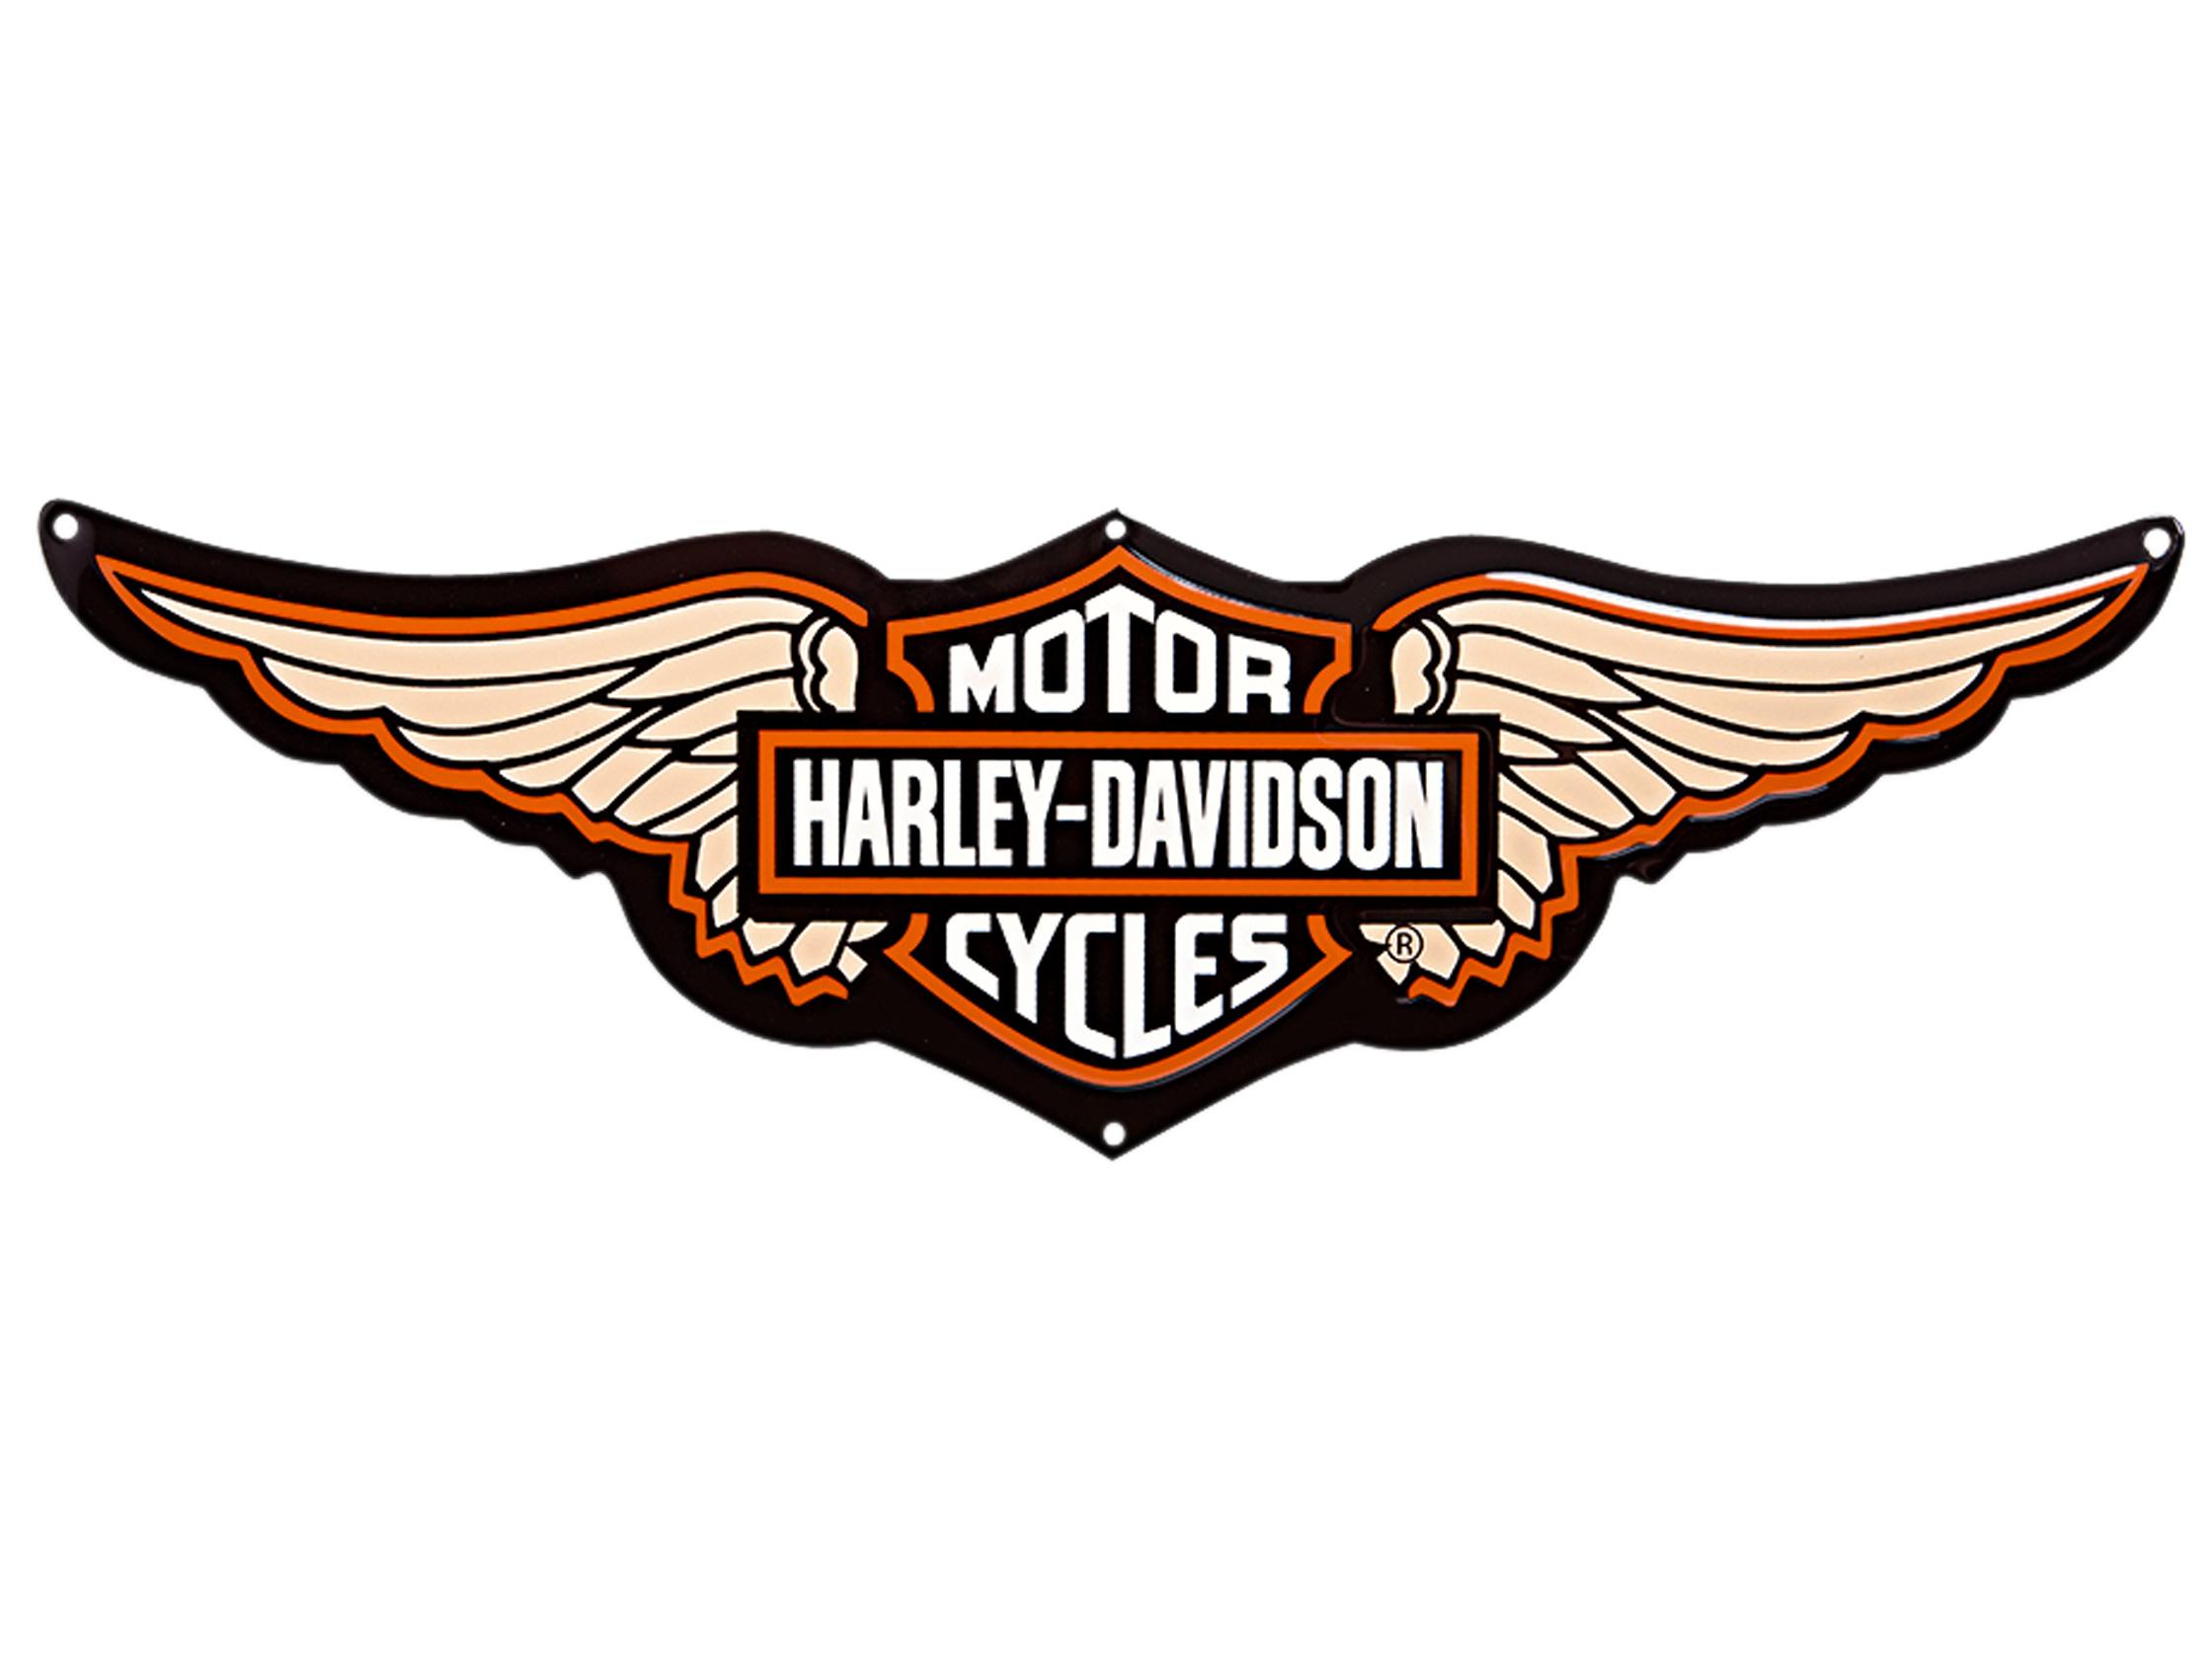 Harley davidson free motorcycle harley clipart 3